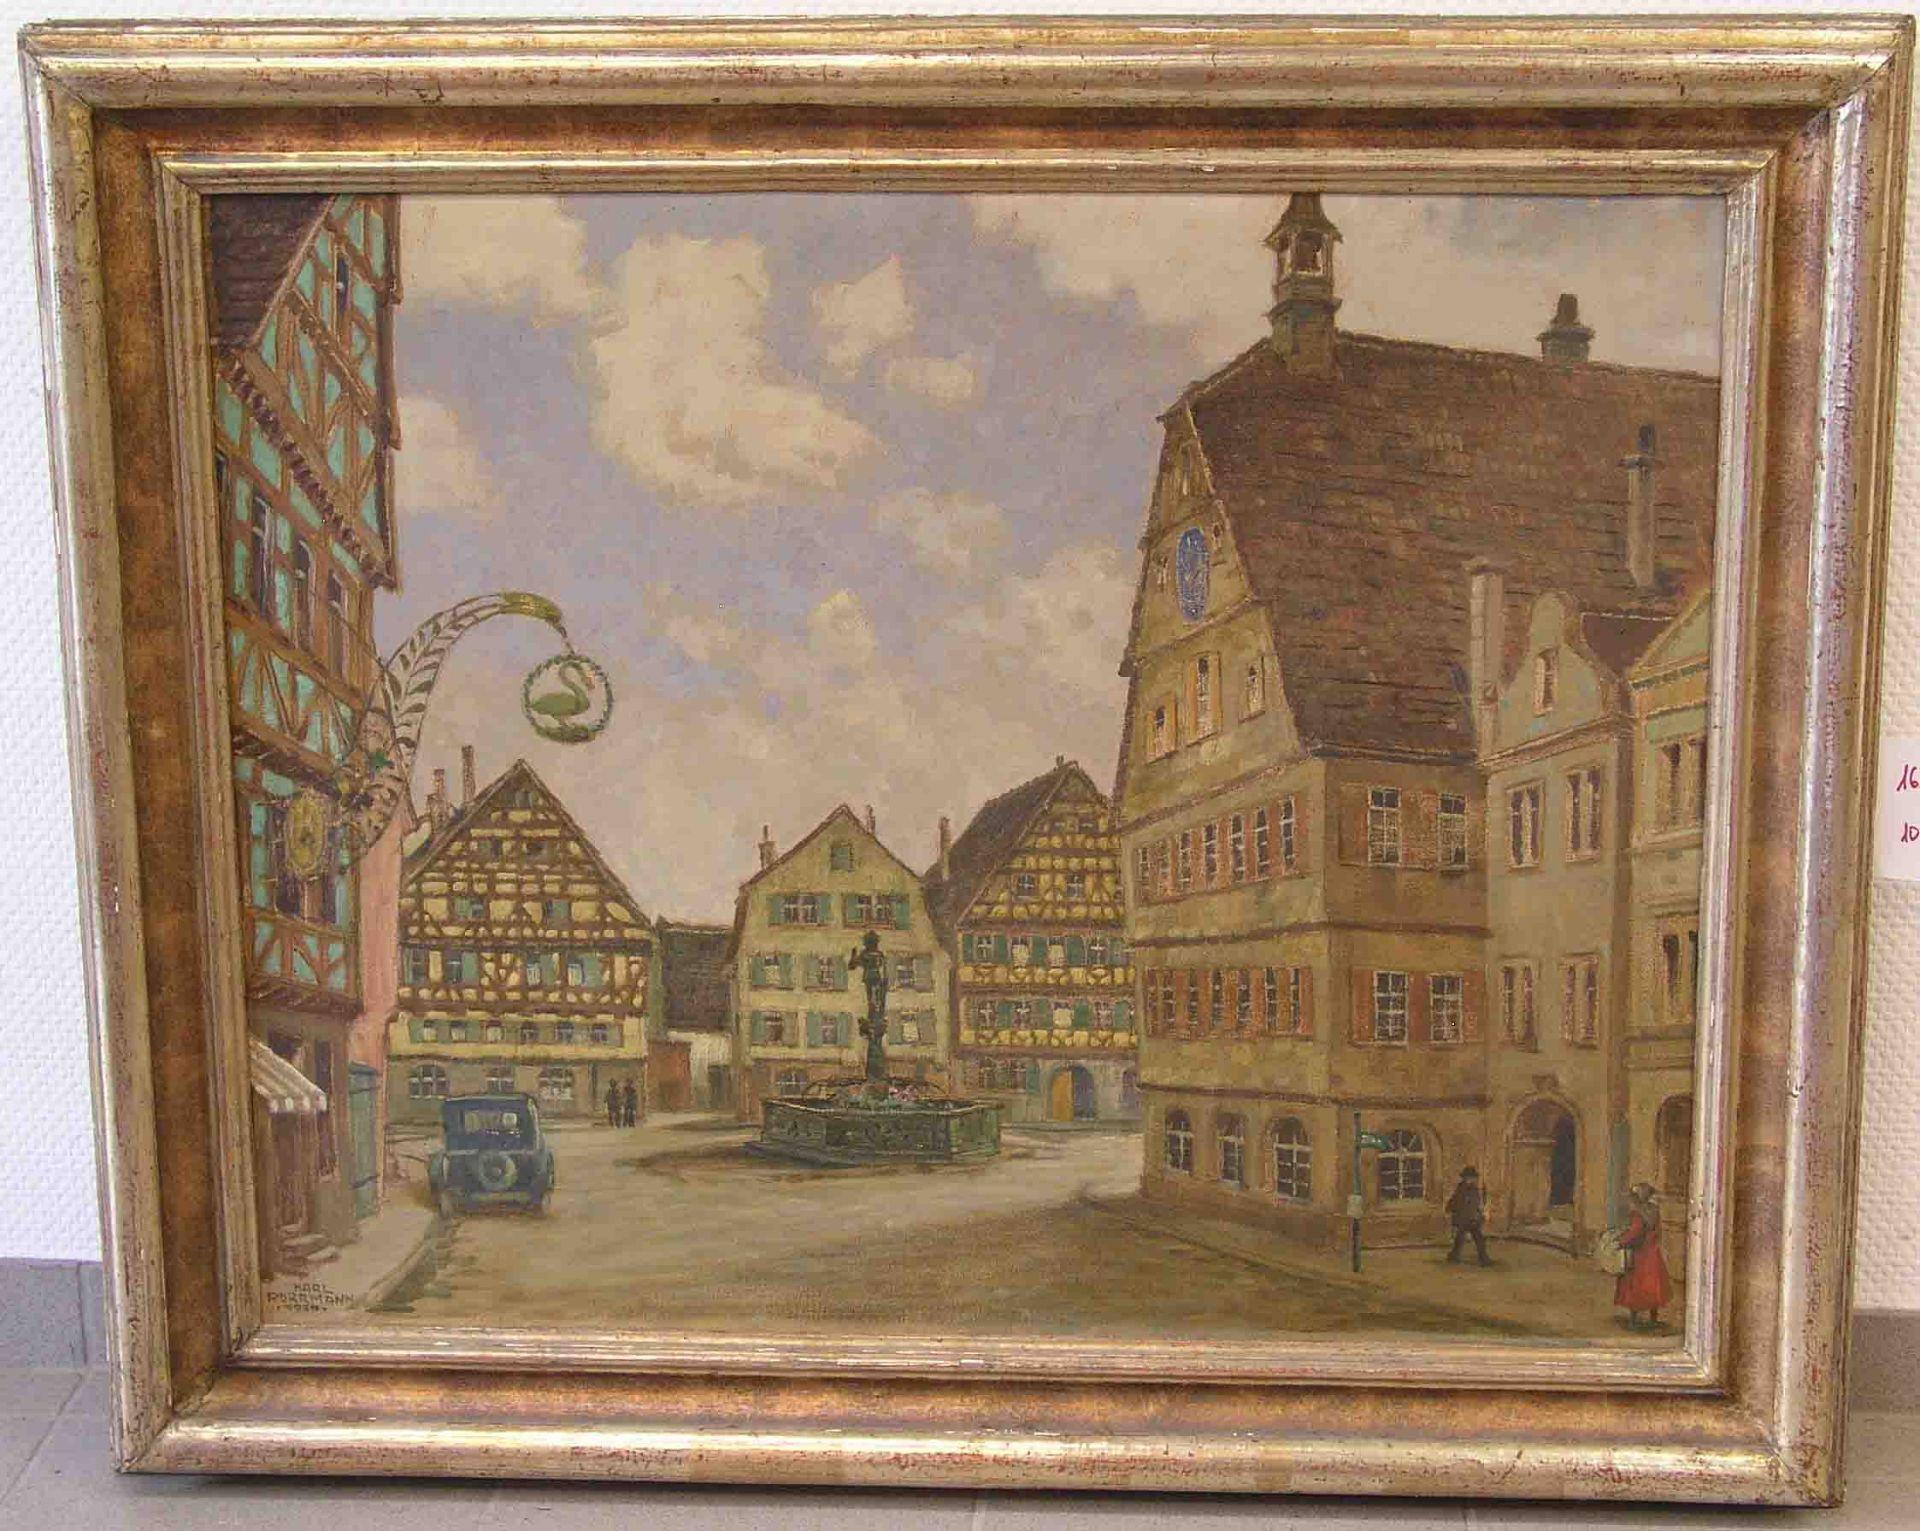 Purmann, Karl (Speyer 1877 - 1966